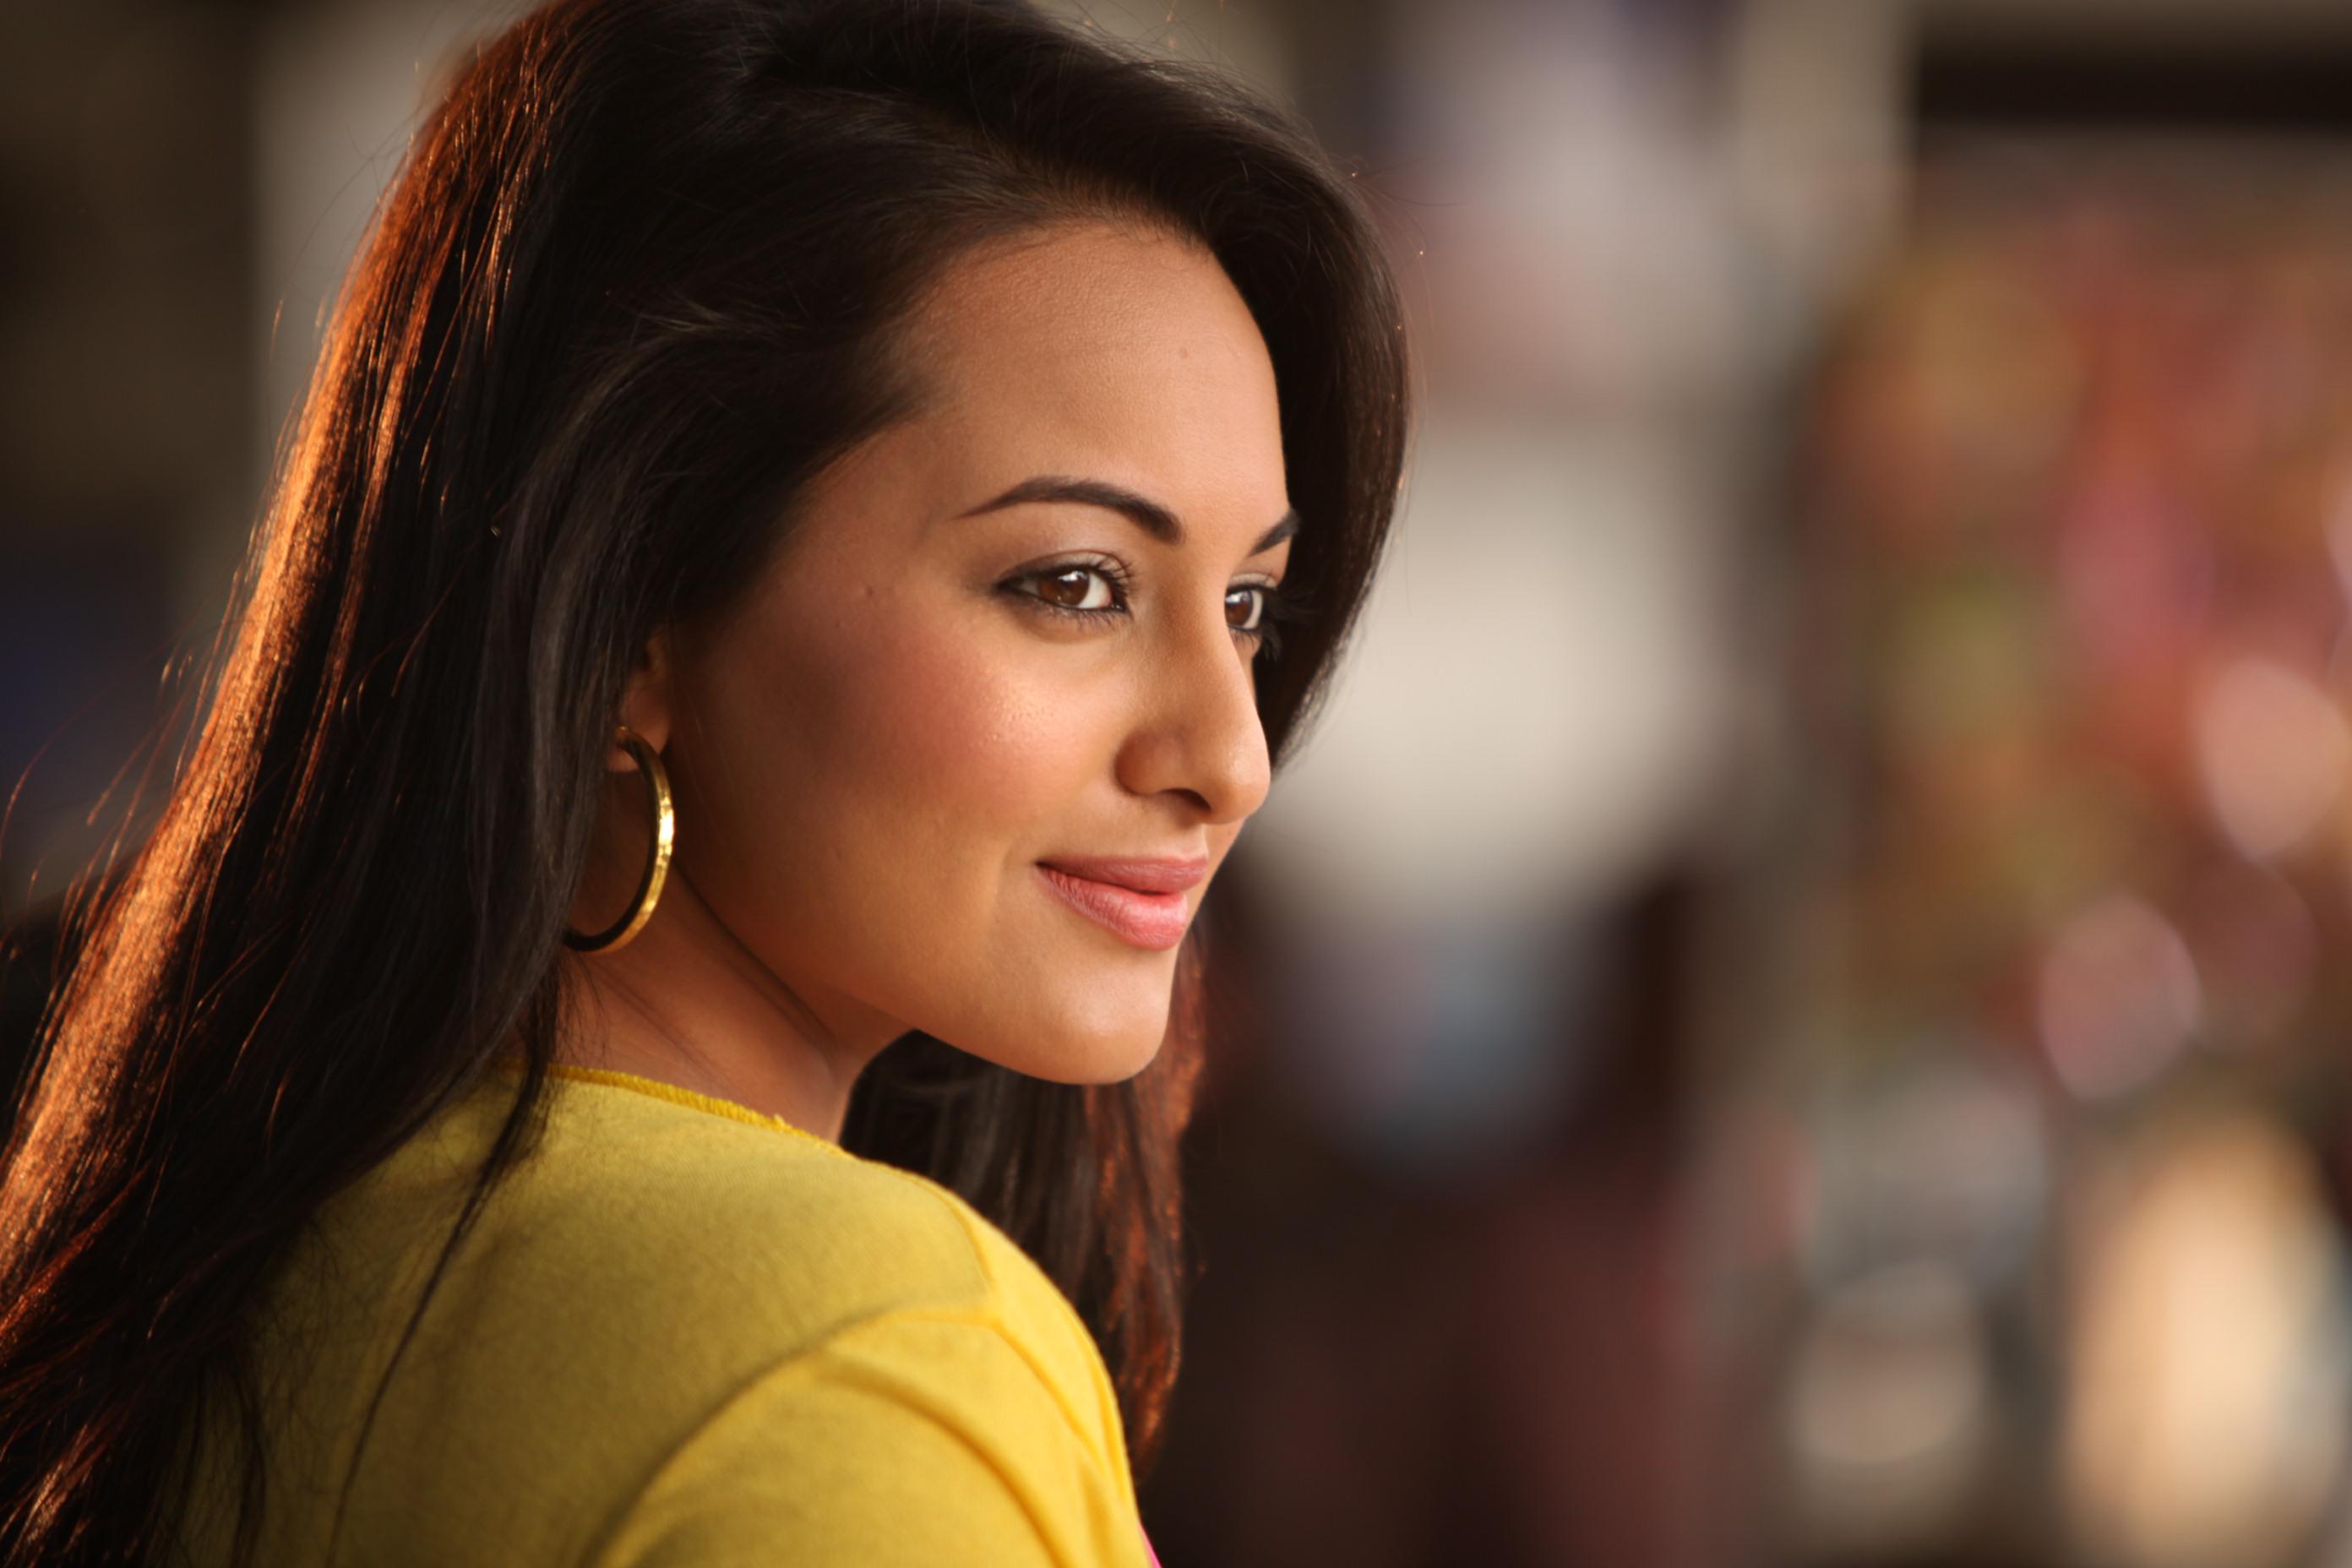 Who will be Salman's leading lady in next movie Anushka Sharma or Sonakshi Sinha.